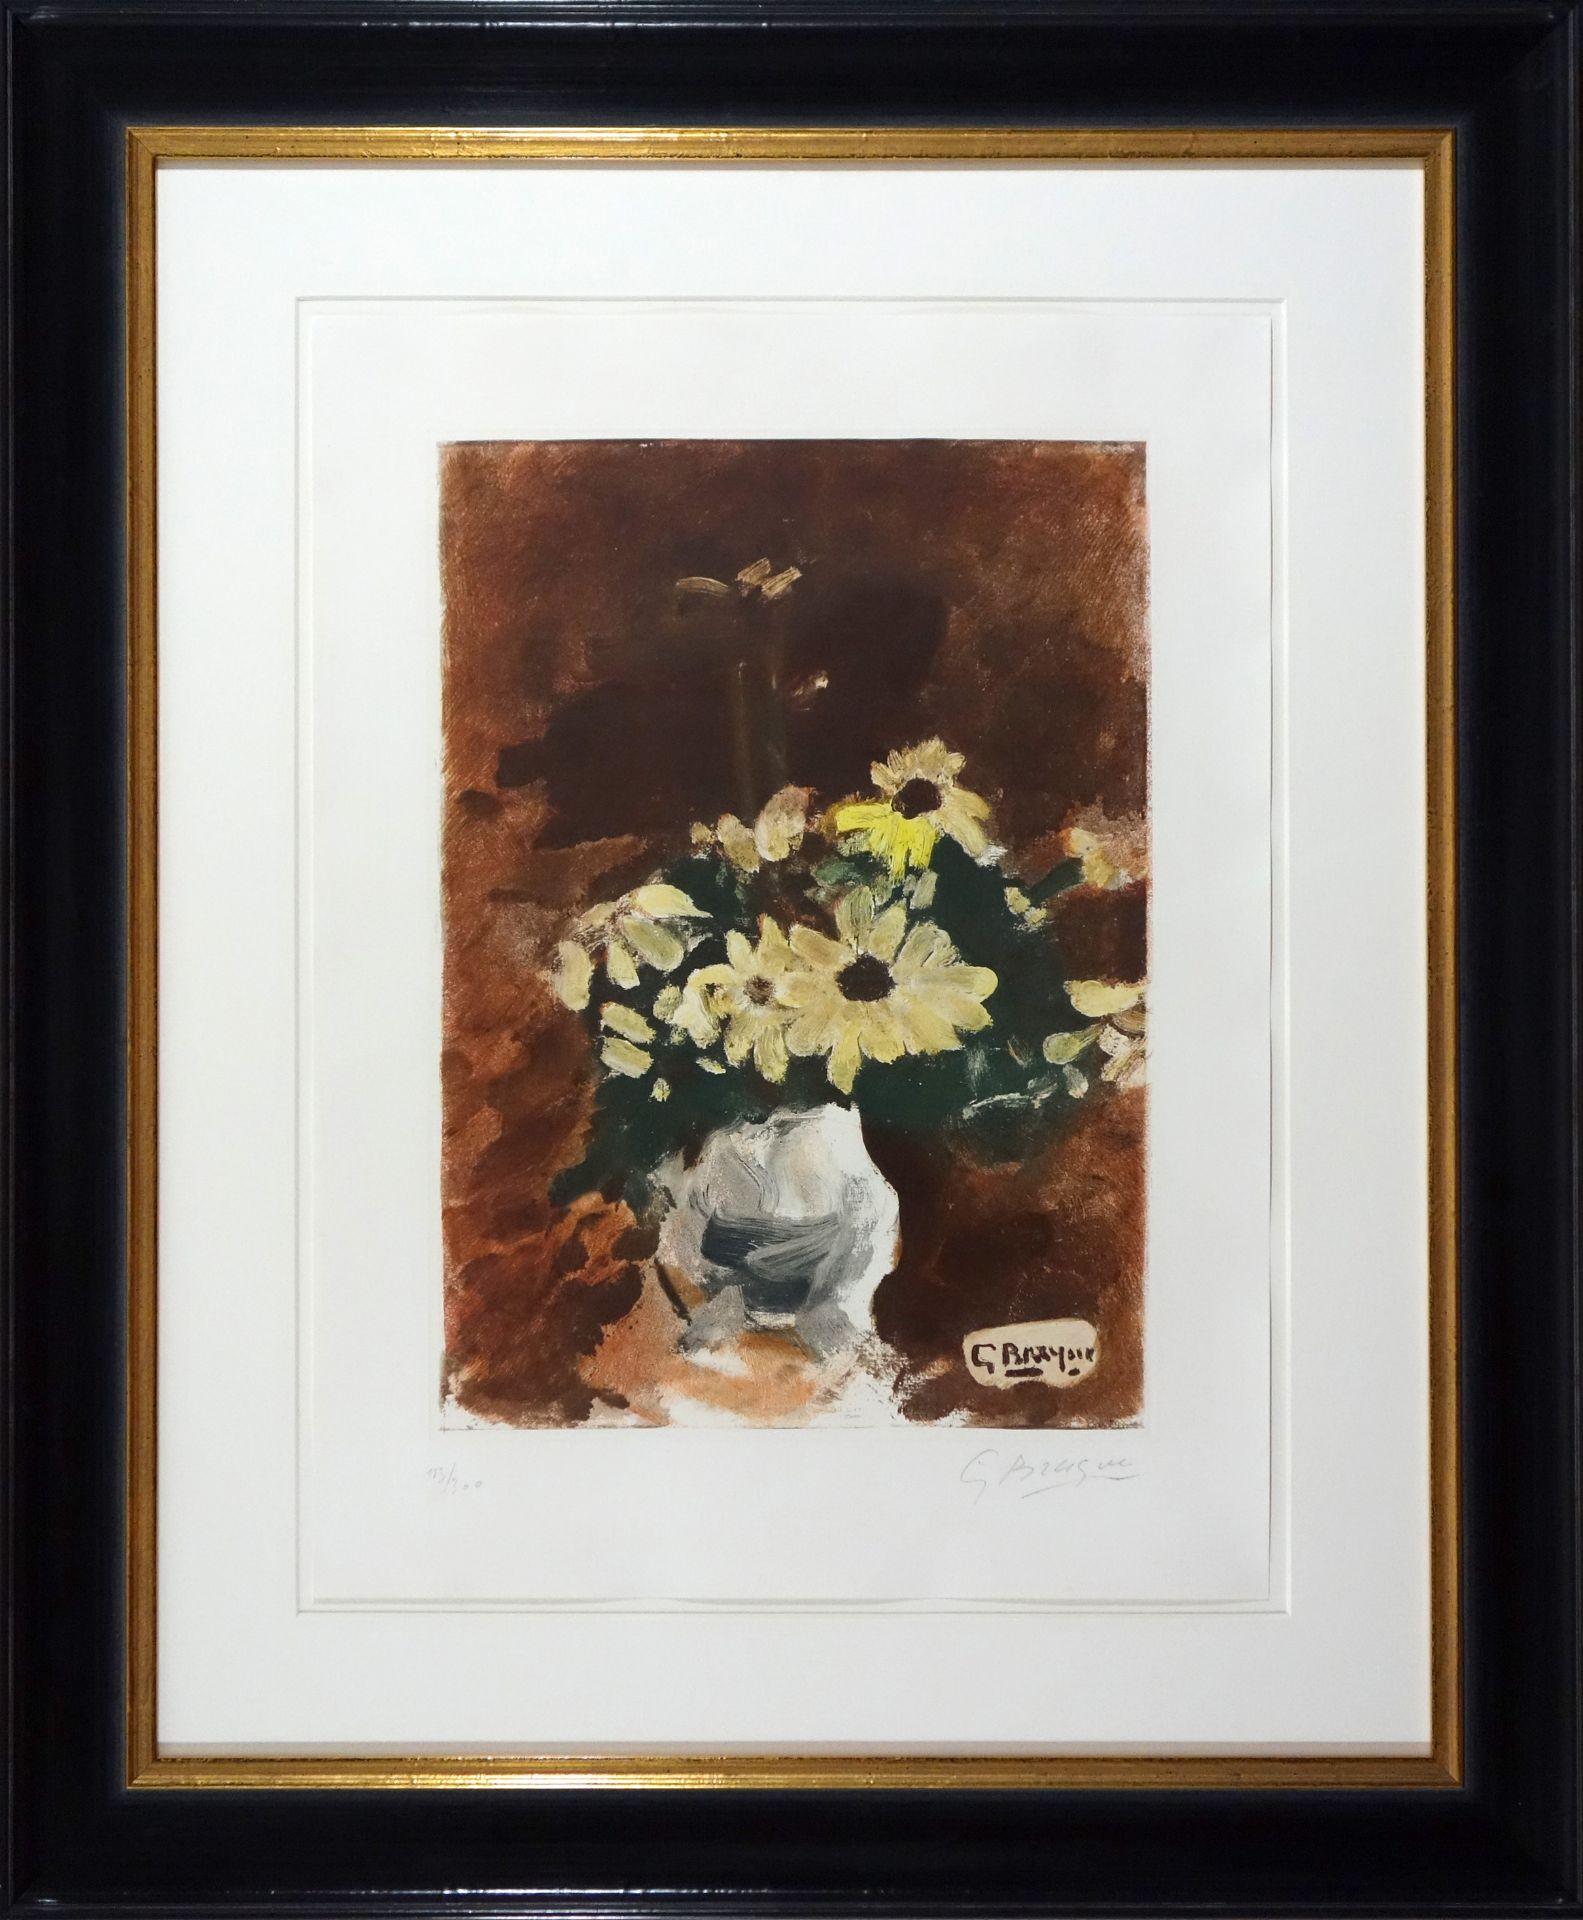 Georges Braque (1882–1963) Vase de fleurs jaunes (1950) - Bild 2 aus 4